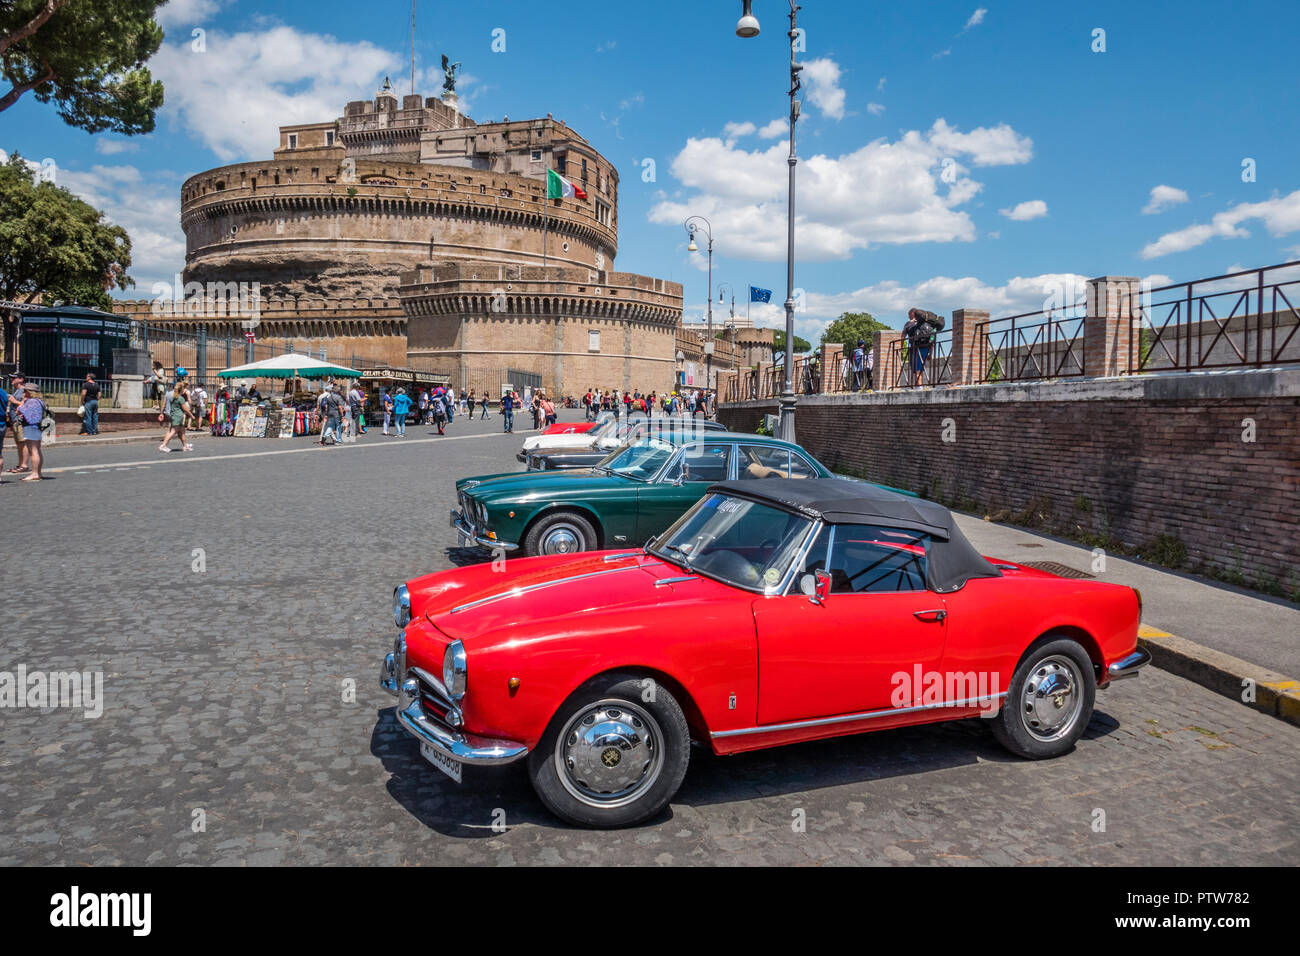 1960 Alfa-Romeo Spider Guiletta vor dem Hintergrund des Castel Sant'Angelo in Rom, Italien Stockbild